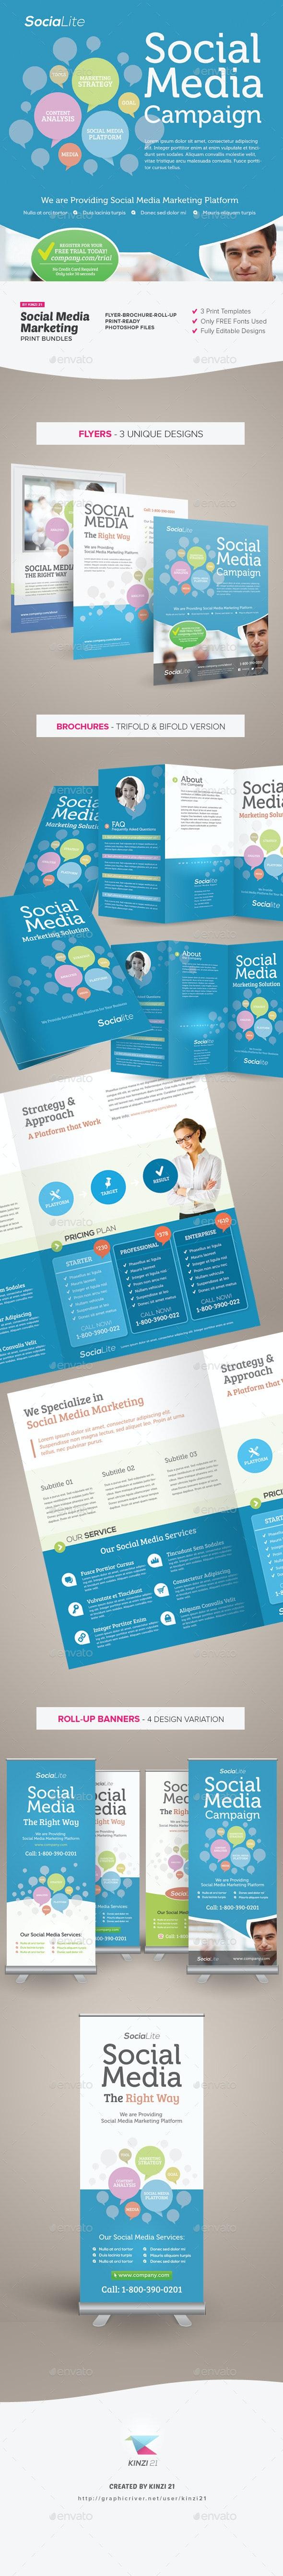 Social Media Marketing Bundle - Print Templates